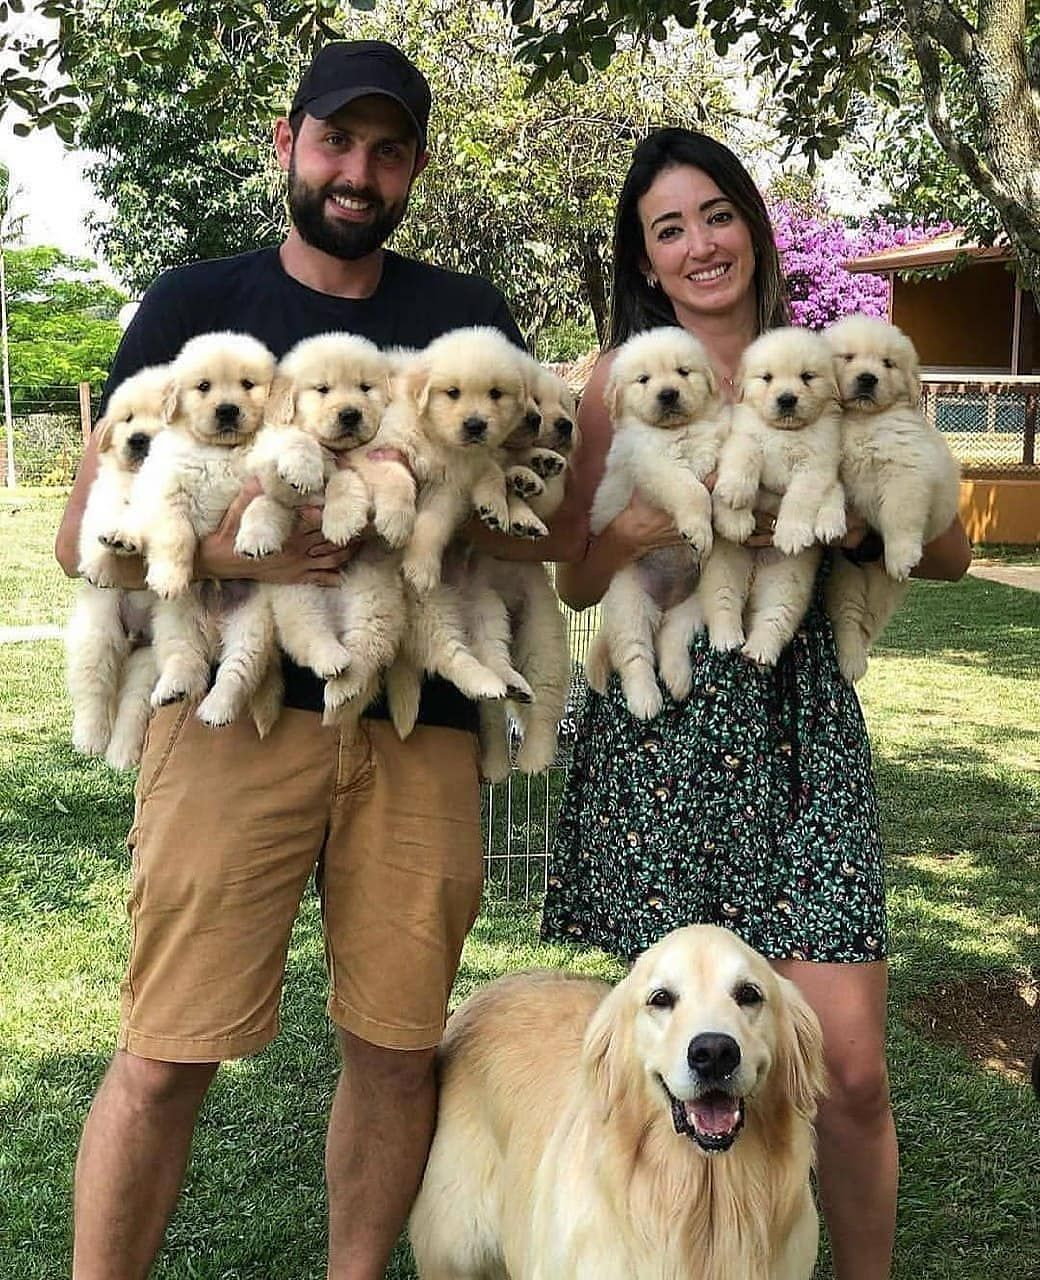 Dog funny 🐶🐶🐶 #dogsdaily #dogslife #dogs_of_instagram #dogsofinstagram #dogsofig #dogsworld #dogsofinstgram #dogscorner #dogsrule #dogslife🐶 #dogs_of_world #dogsonadventures #dogs #dogsofinstaworld #dogselfie #dogshow #dogslover #dogsofinsta #dogsitting #dogstagram